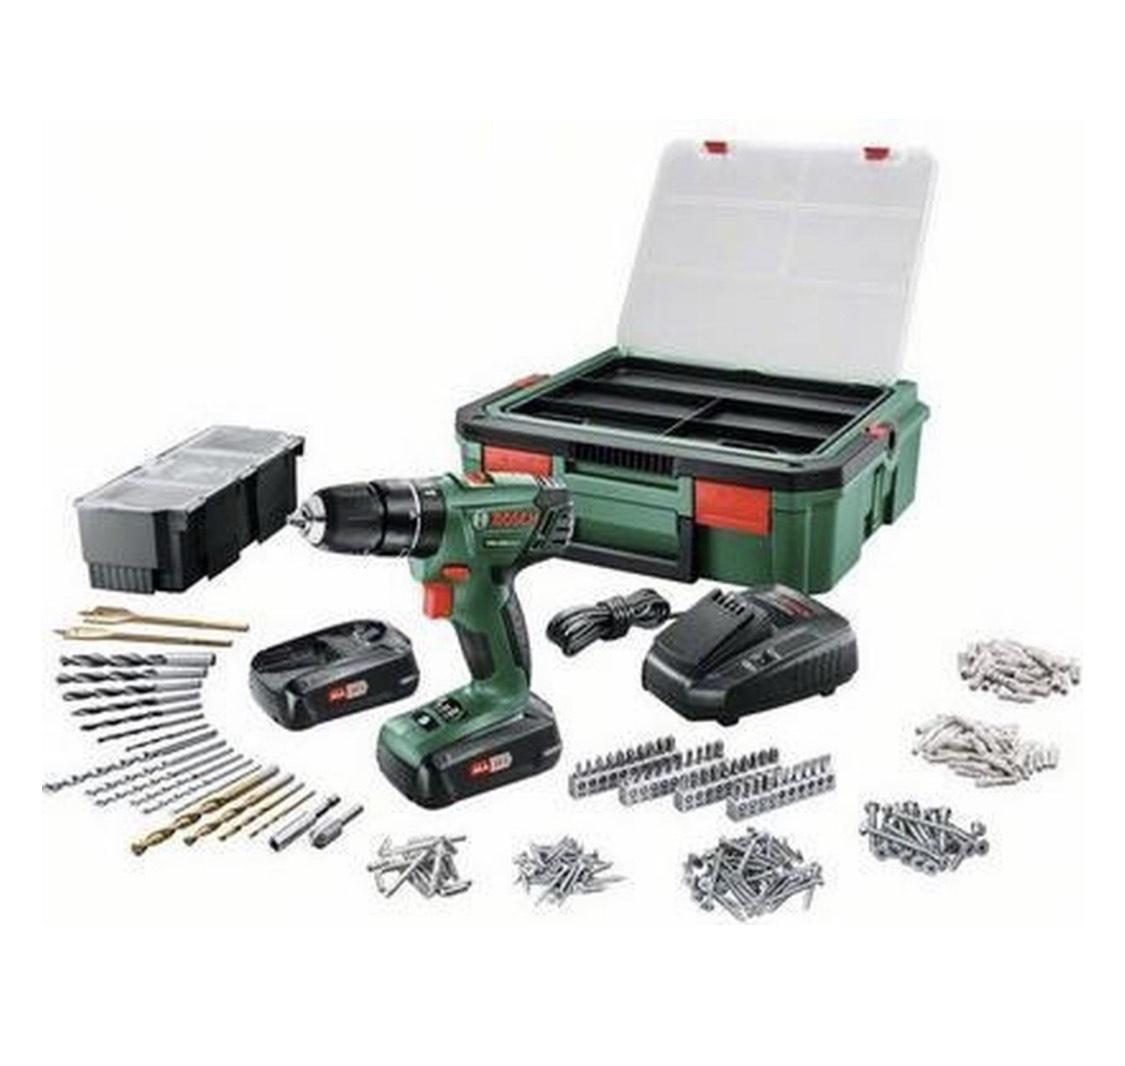 [Select deal] Bosch PSB 1800 LI-2 klopboormachine Incl. 2 accu's & 241 accessoires